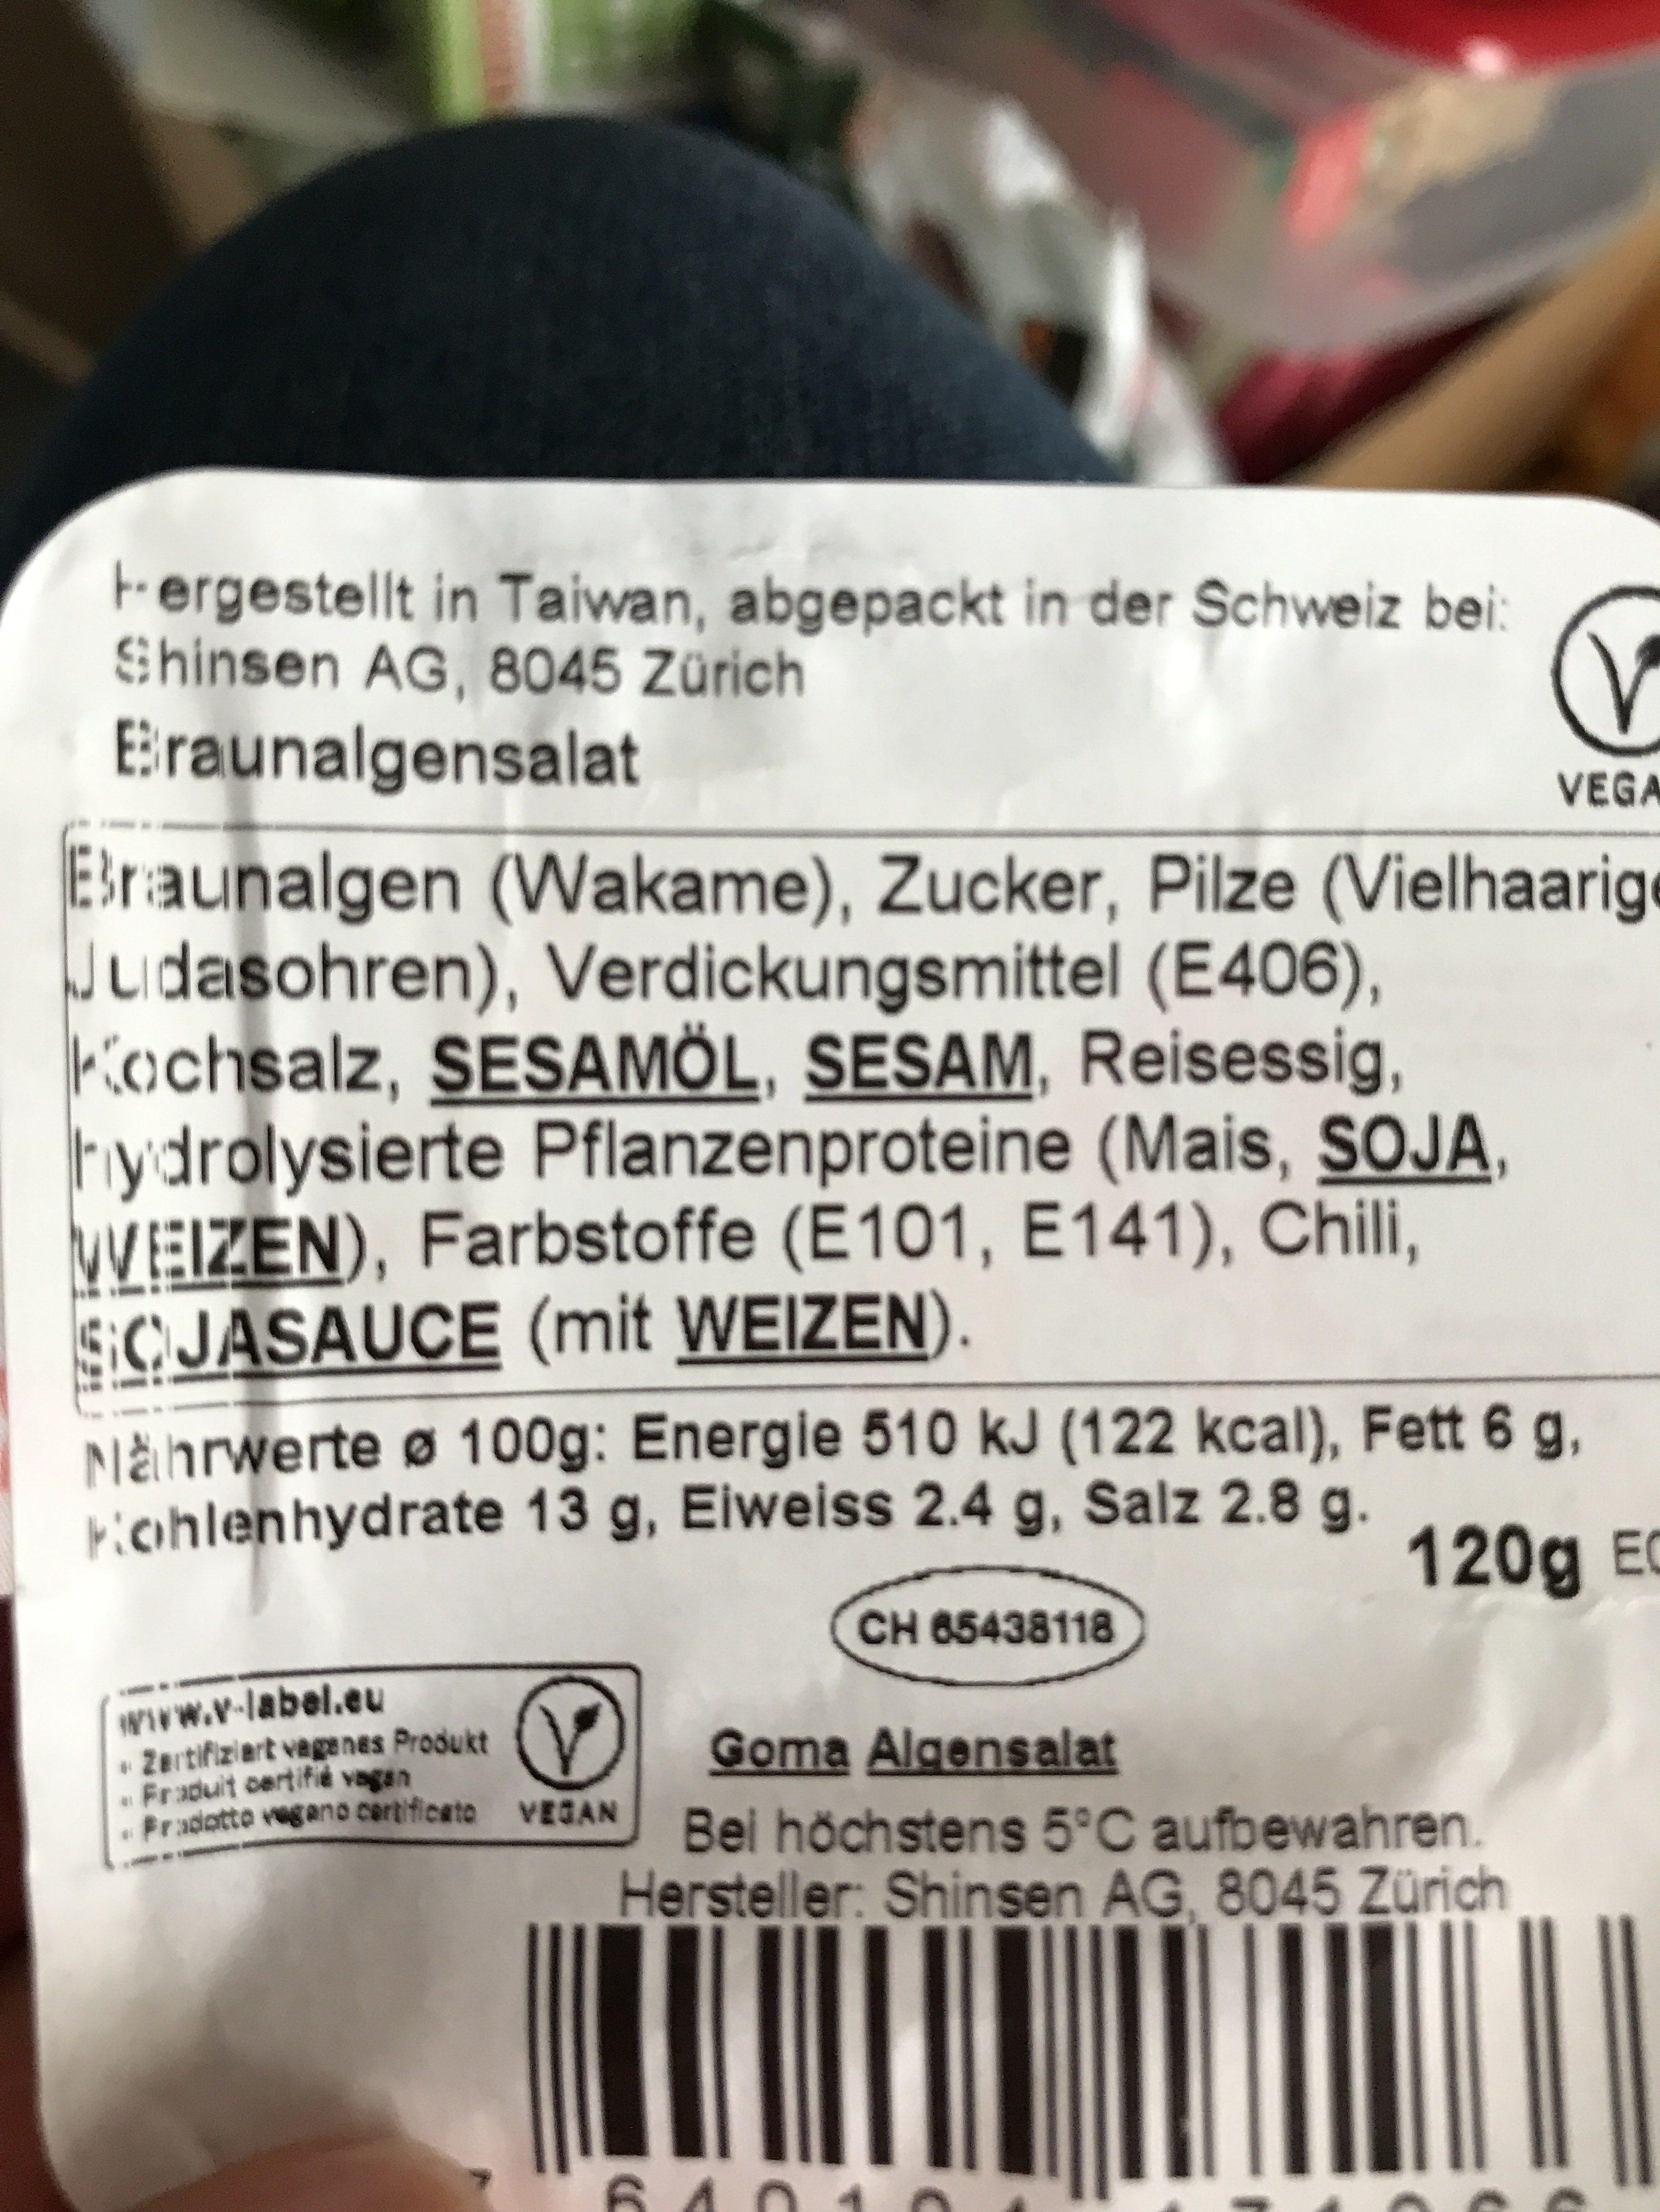 Goma Algensalat - Ingredients